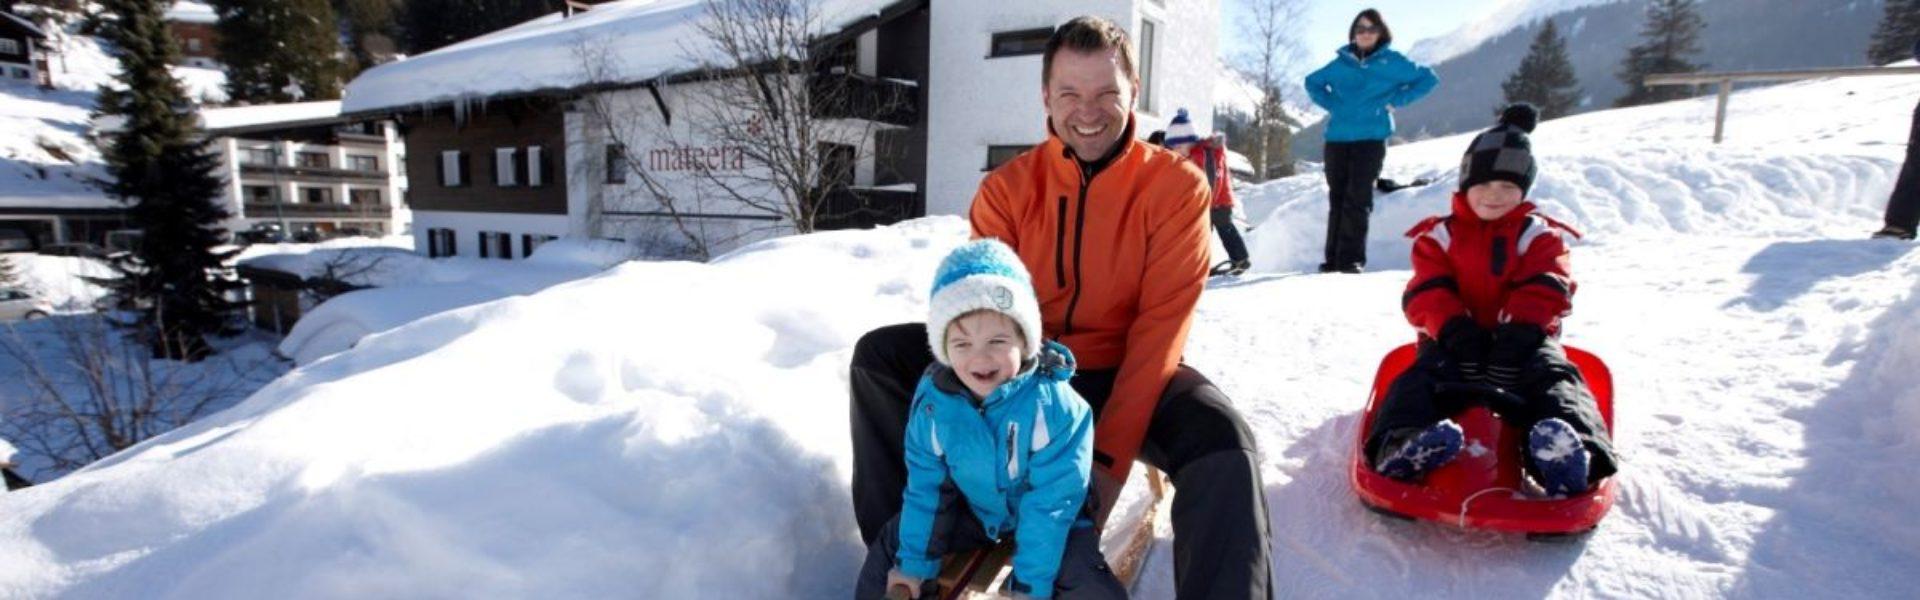 Top Family Familienhotel Mateera, Gargellen, rodeln © Schwärzler Hotel Management